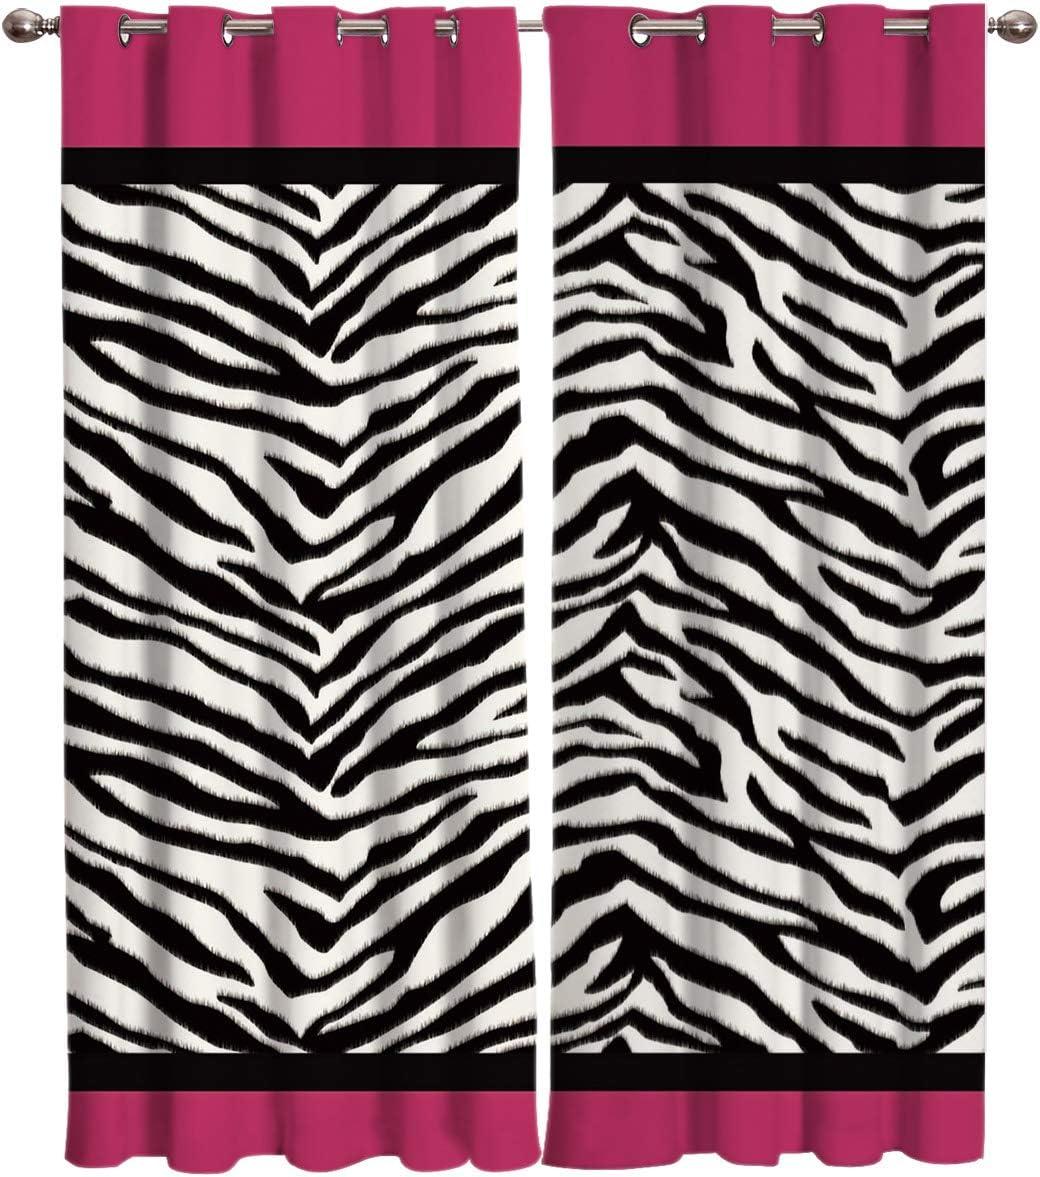 Vandarllin Animal Zebra 激安価格と即納で通信販売 Print Window Treatments Panels 割引 of 2 Sets